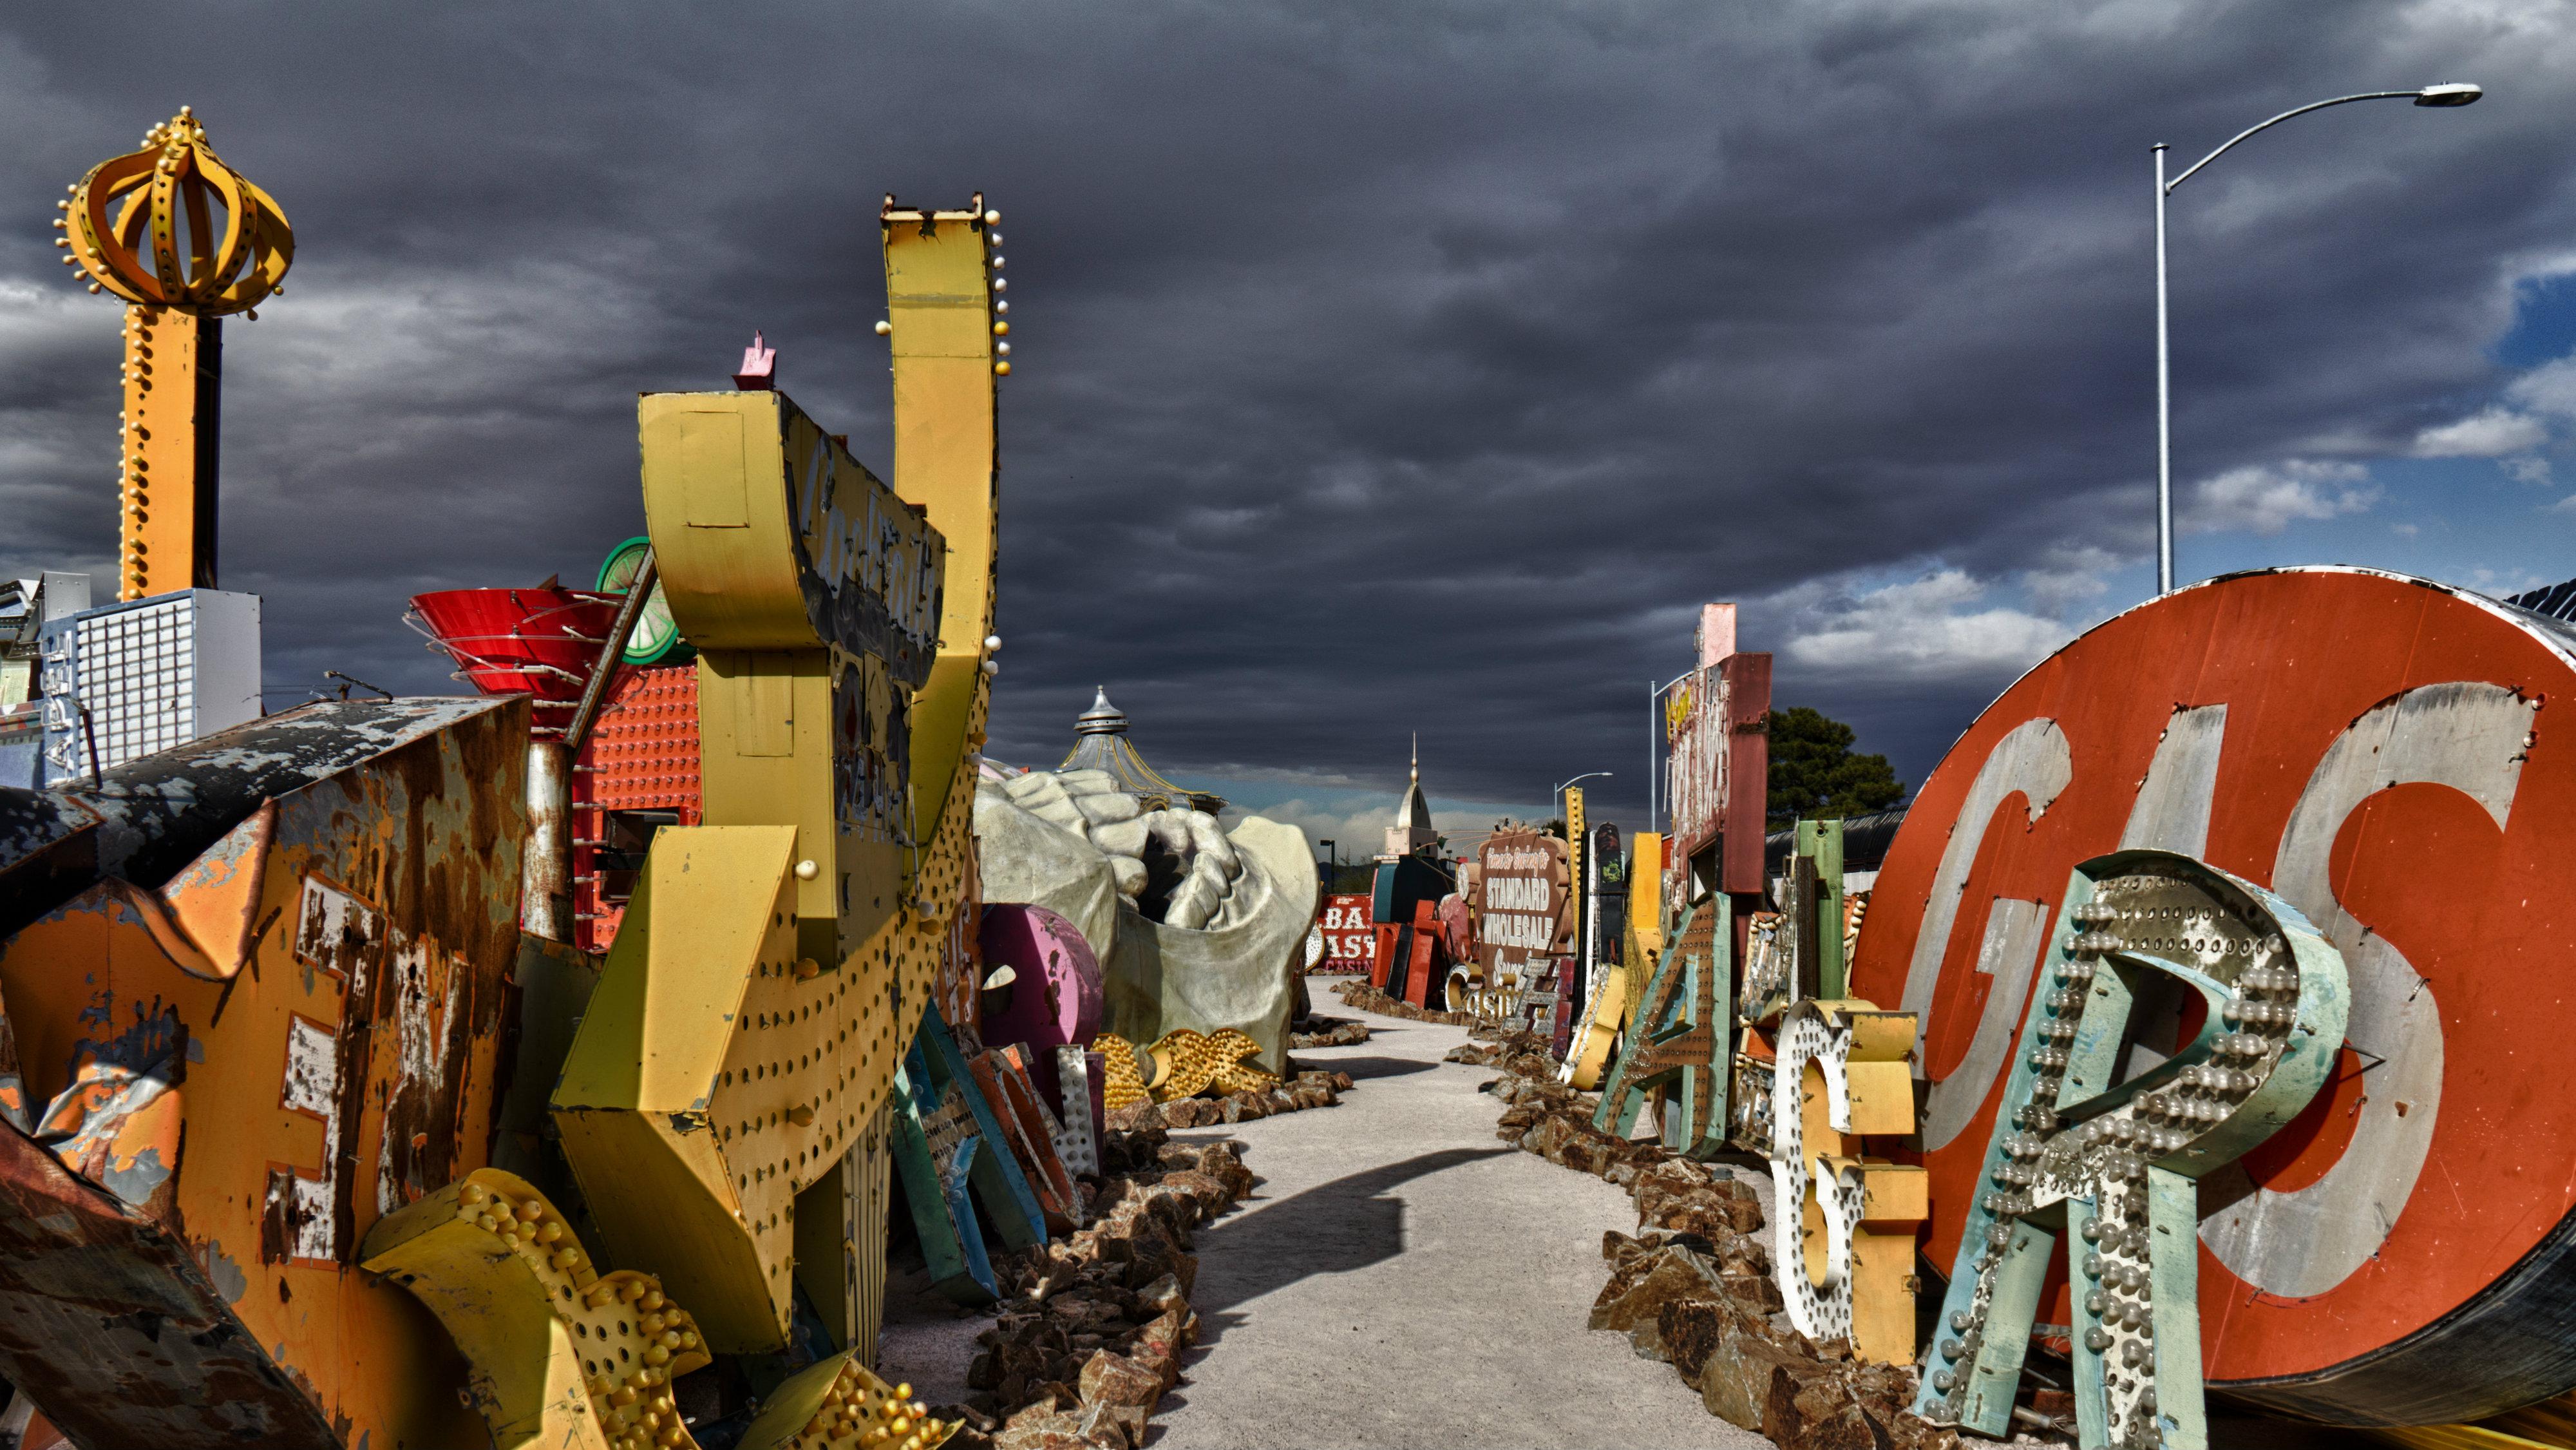 The Neon Museum's boneyard